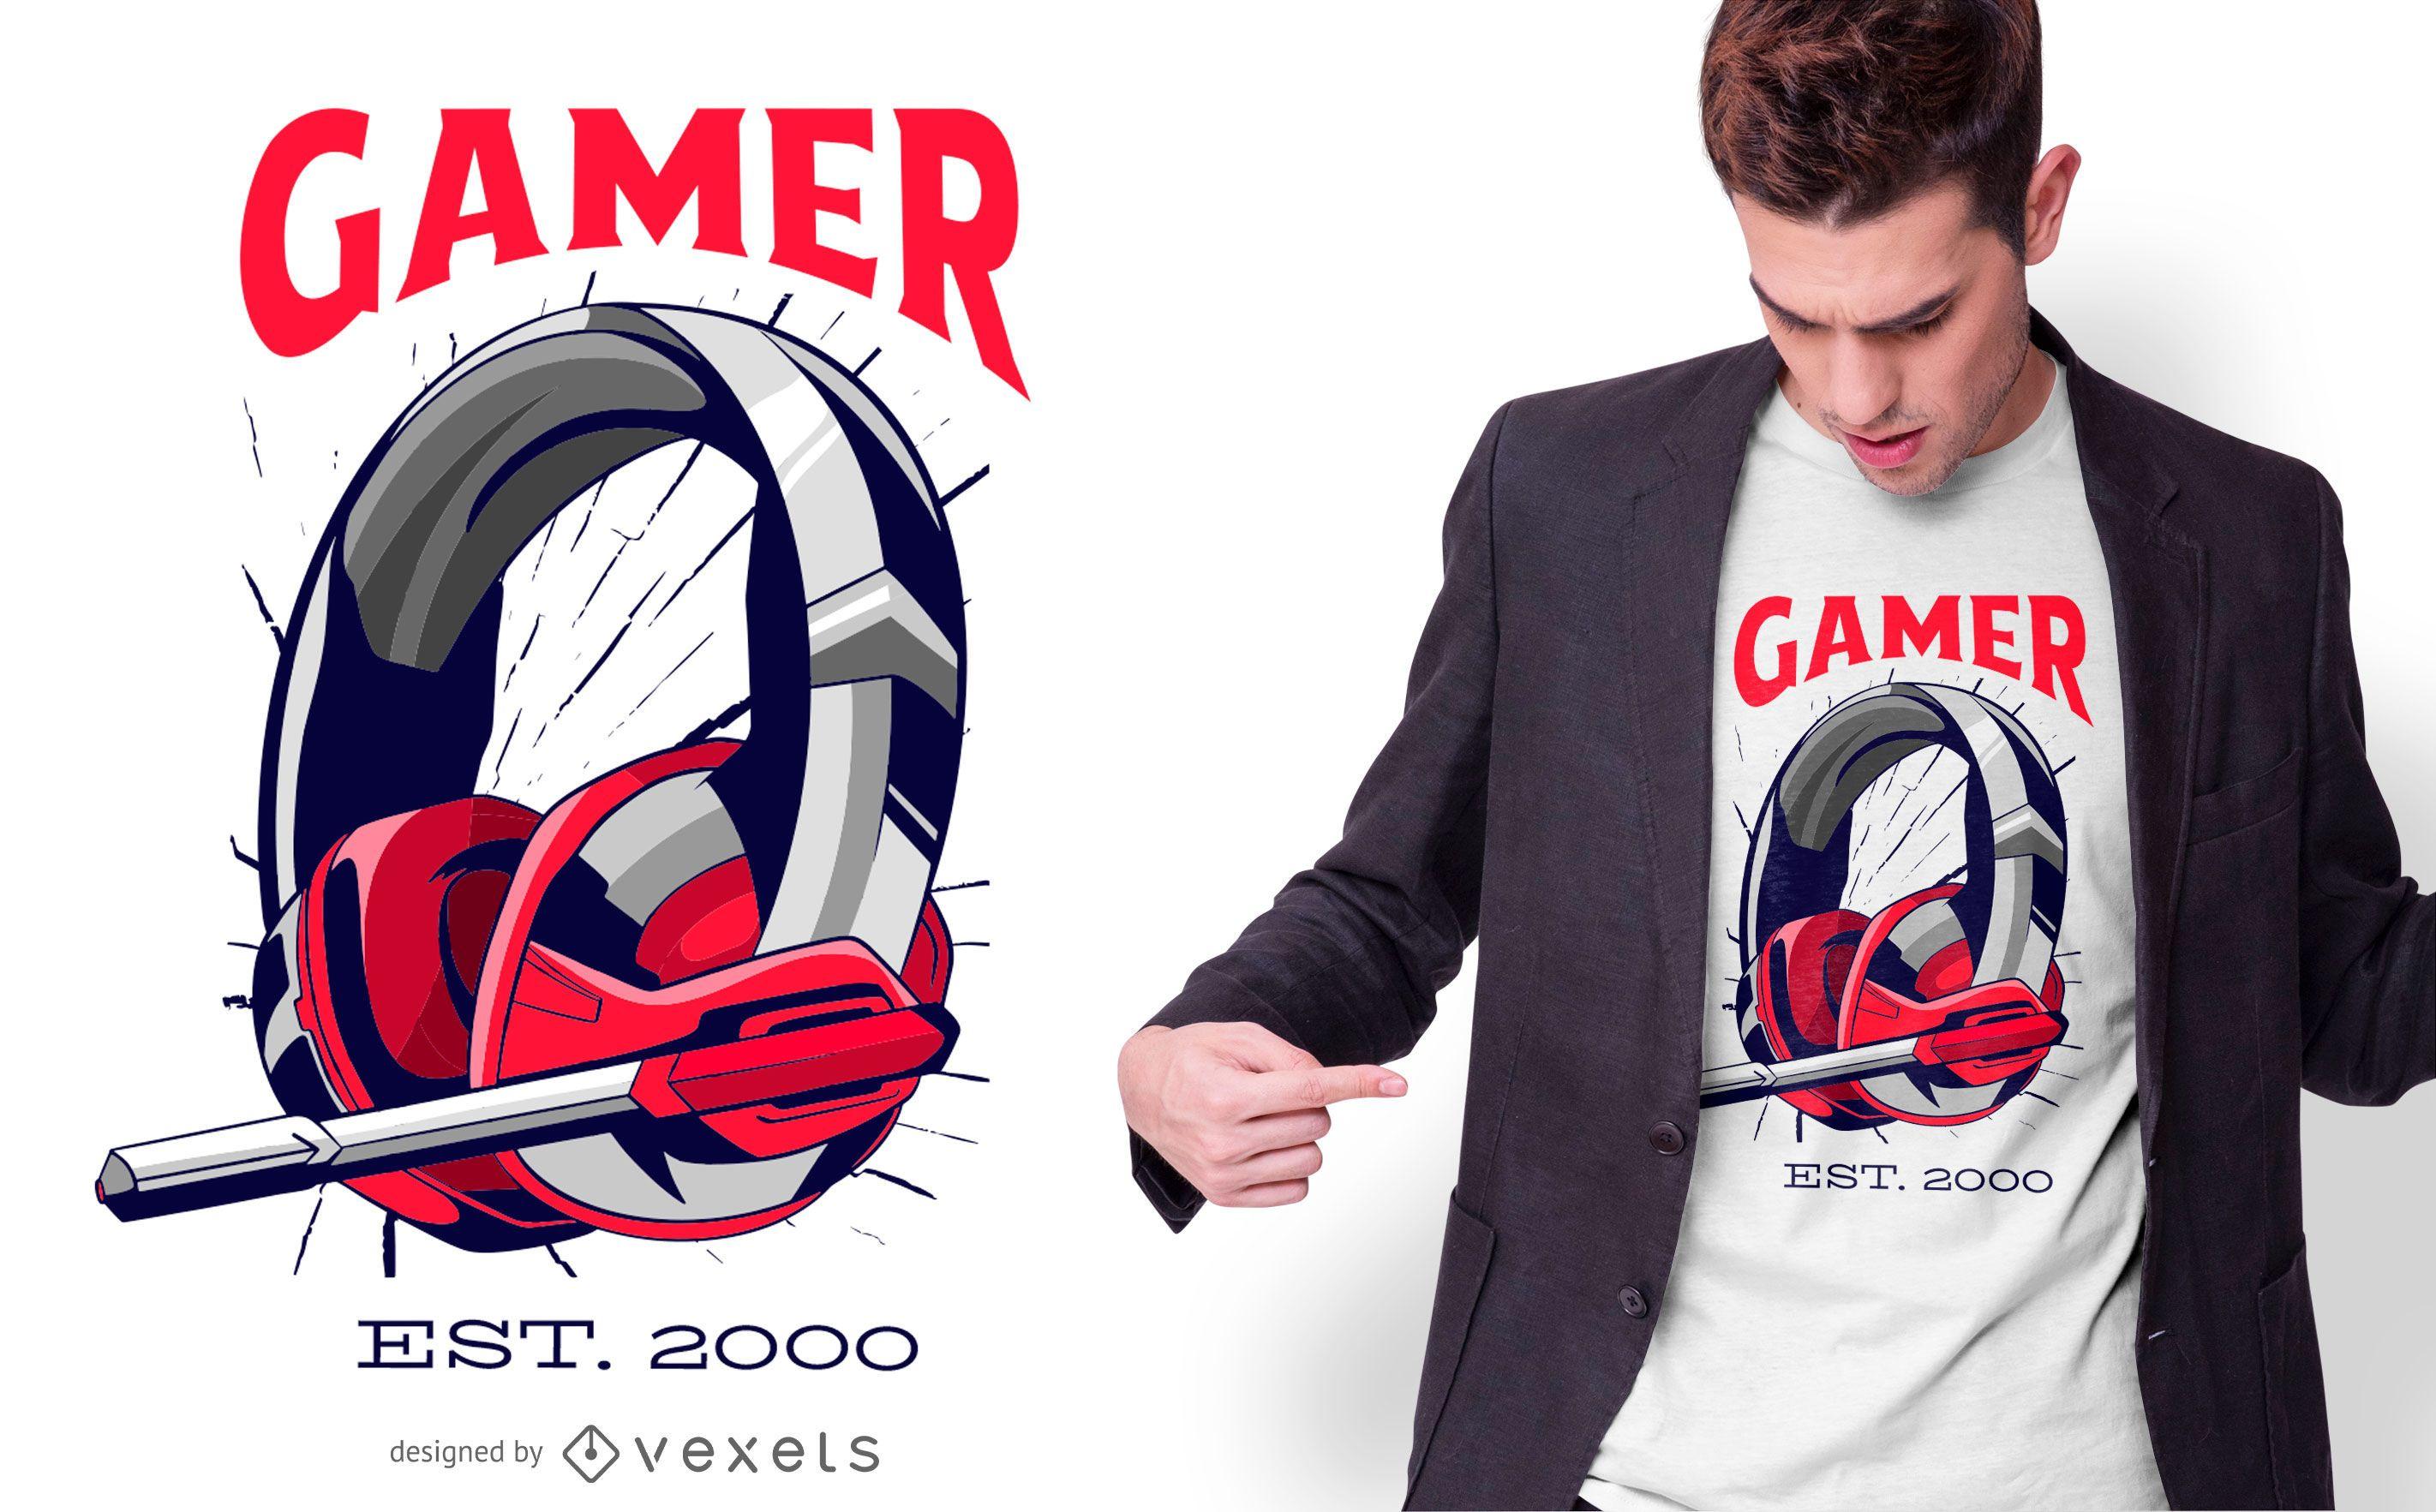 Gamer Headset T-shirt Design